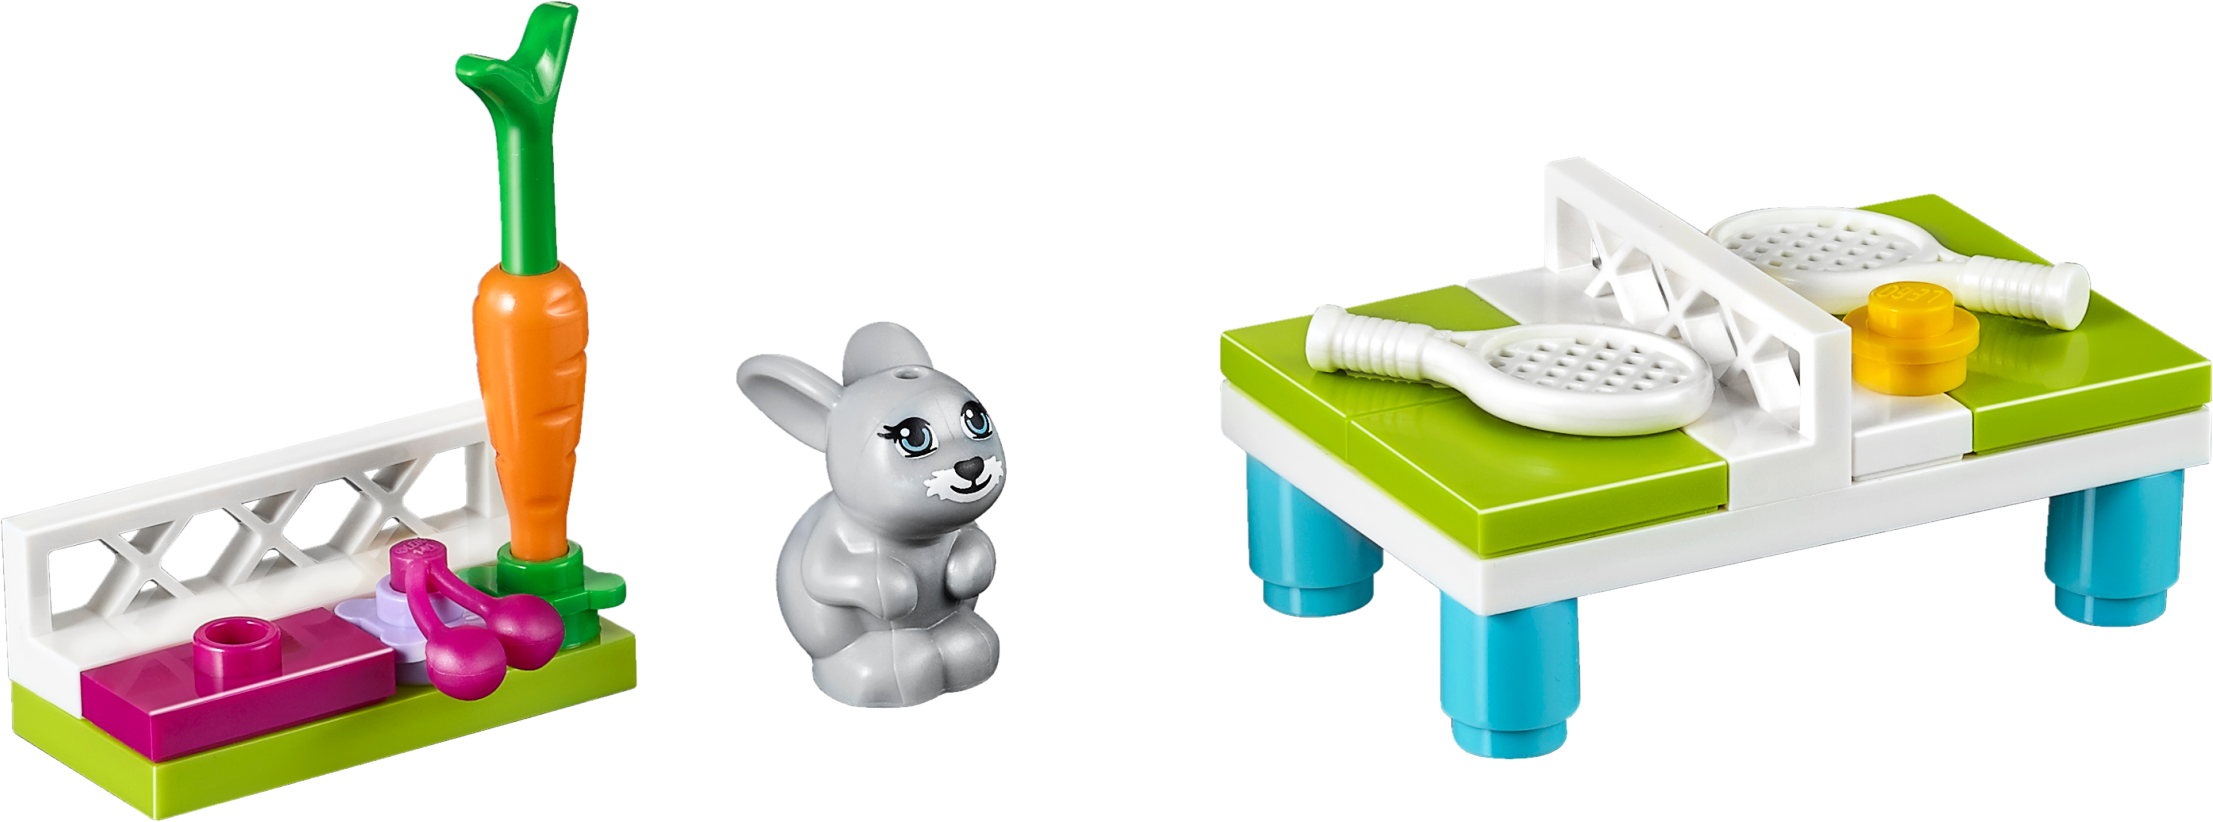 LEGO® Friends Build My Heartlake City Accessory Set